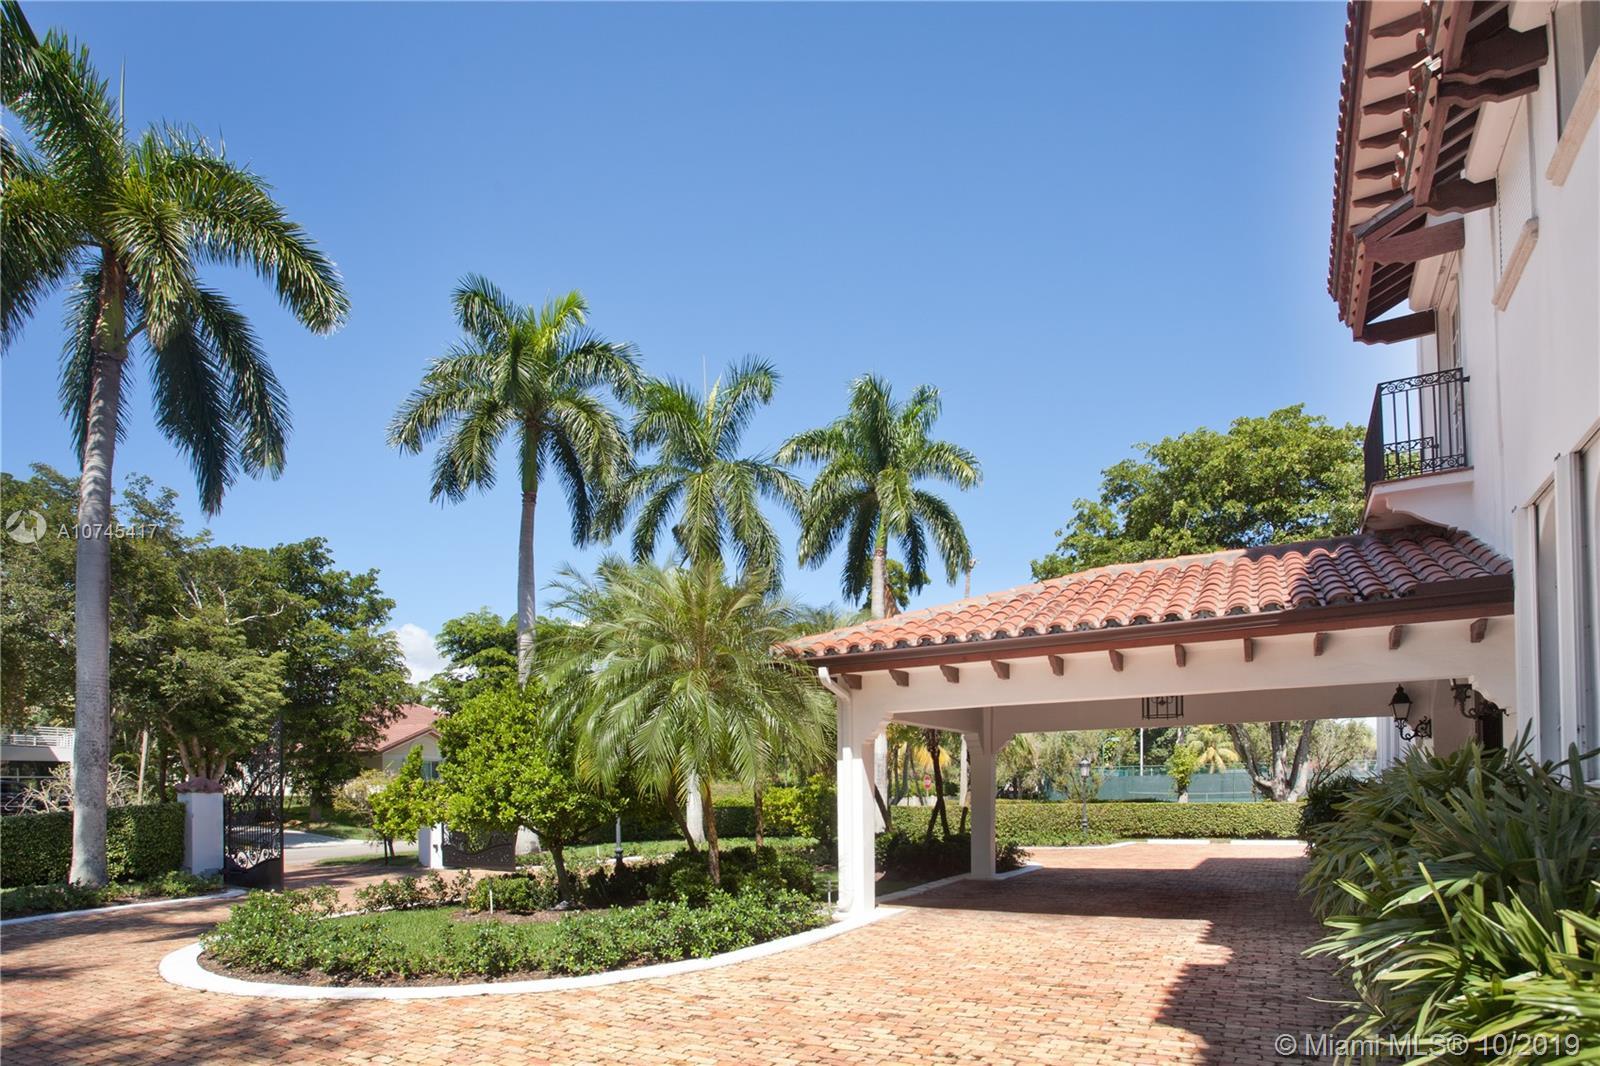 Photo - 7801 Los Pinos Blvd, Coral Gables FL 33143